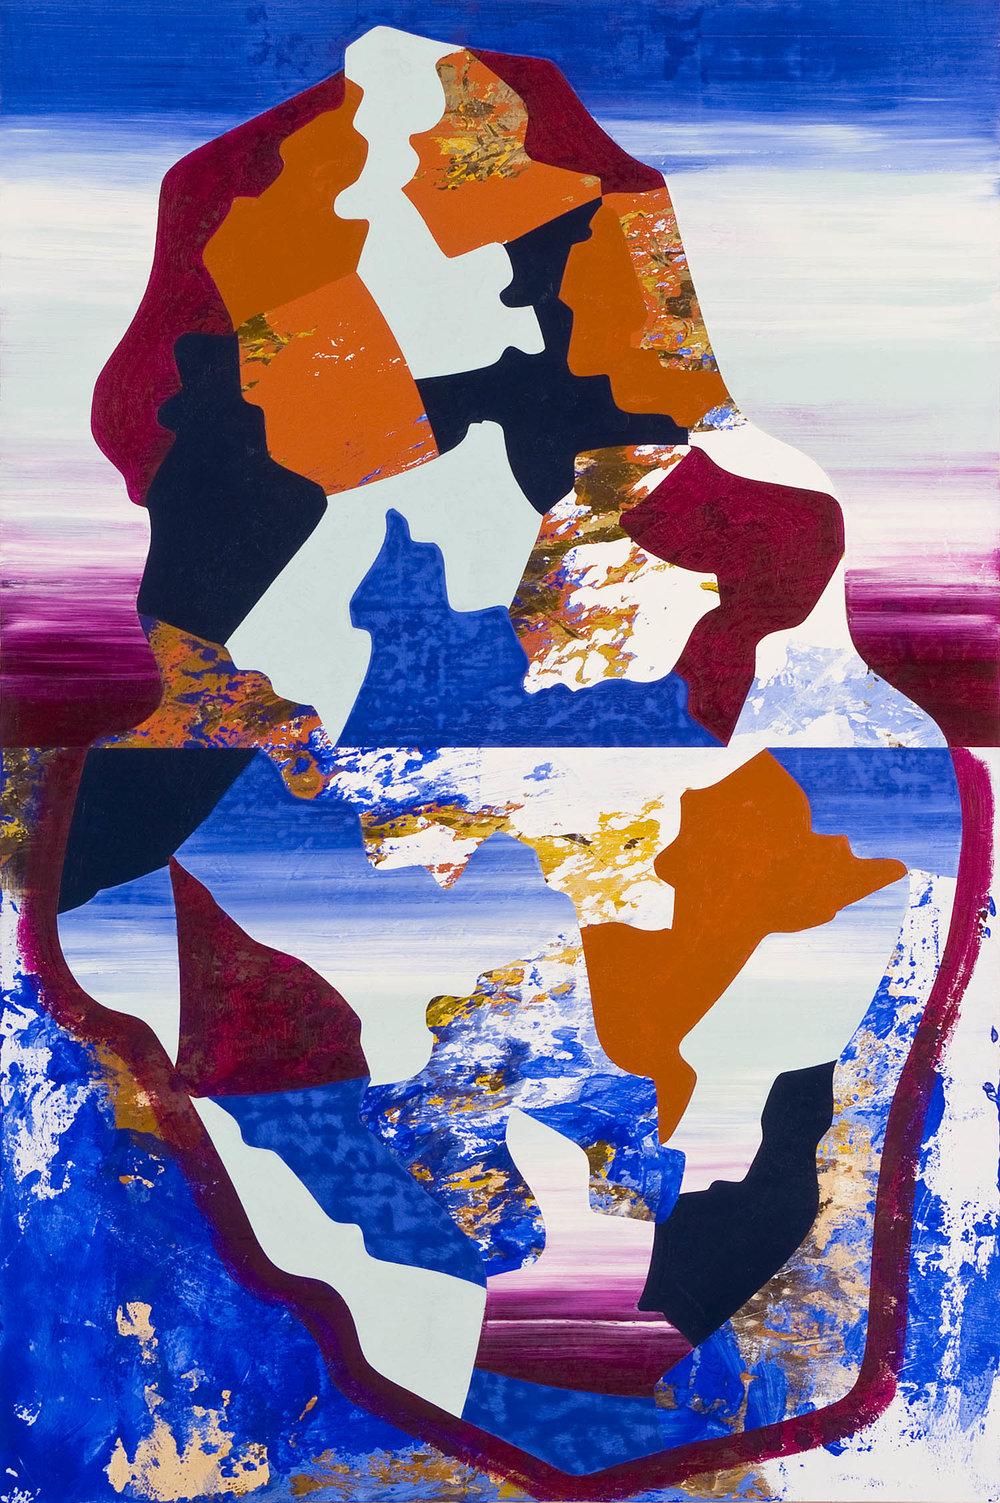 Untitled | 2008 | Öl und Acryl auf Holz | 91,5 x 61 cm